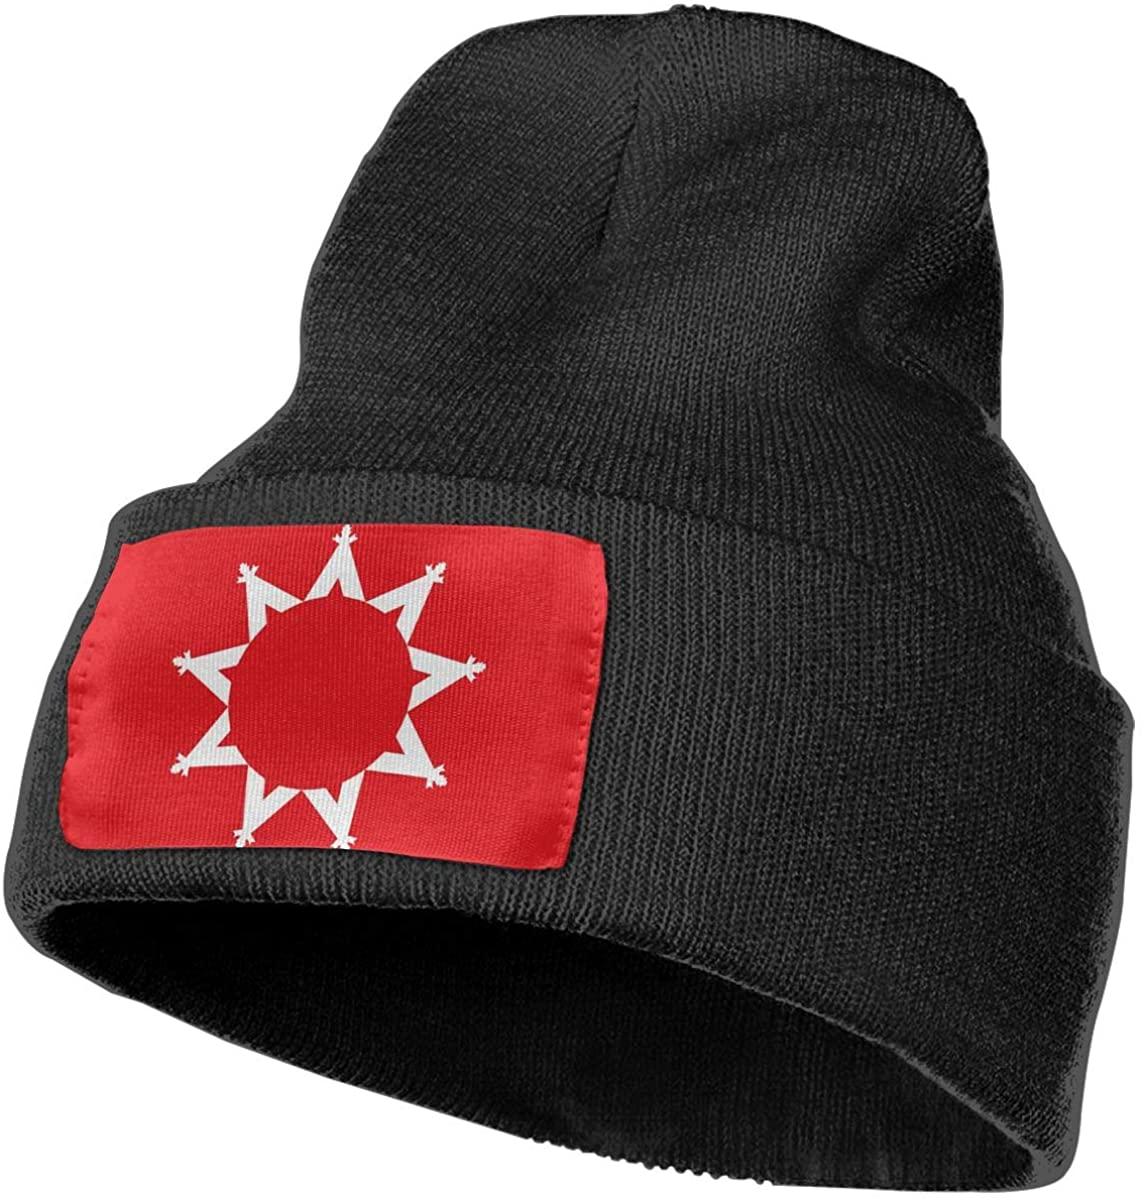 Oglala Sioux Tribe Flag Unisex Cuffed Plain Skull Knit Hat Cap Winter Beanie Toboggan Cap